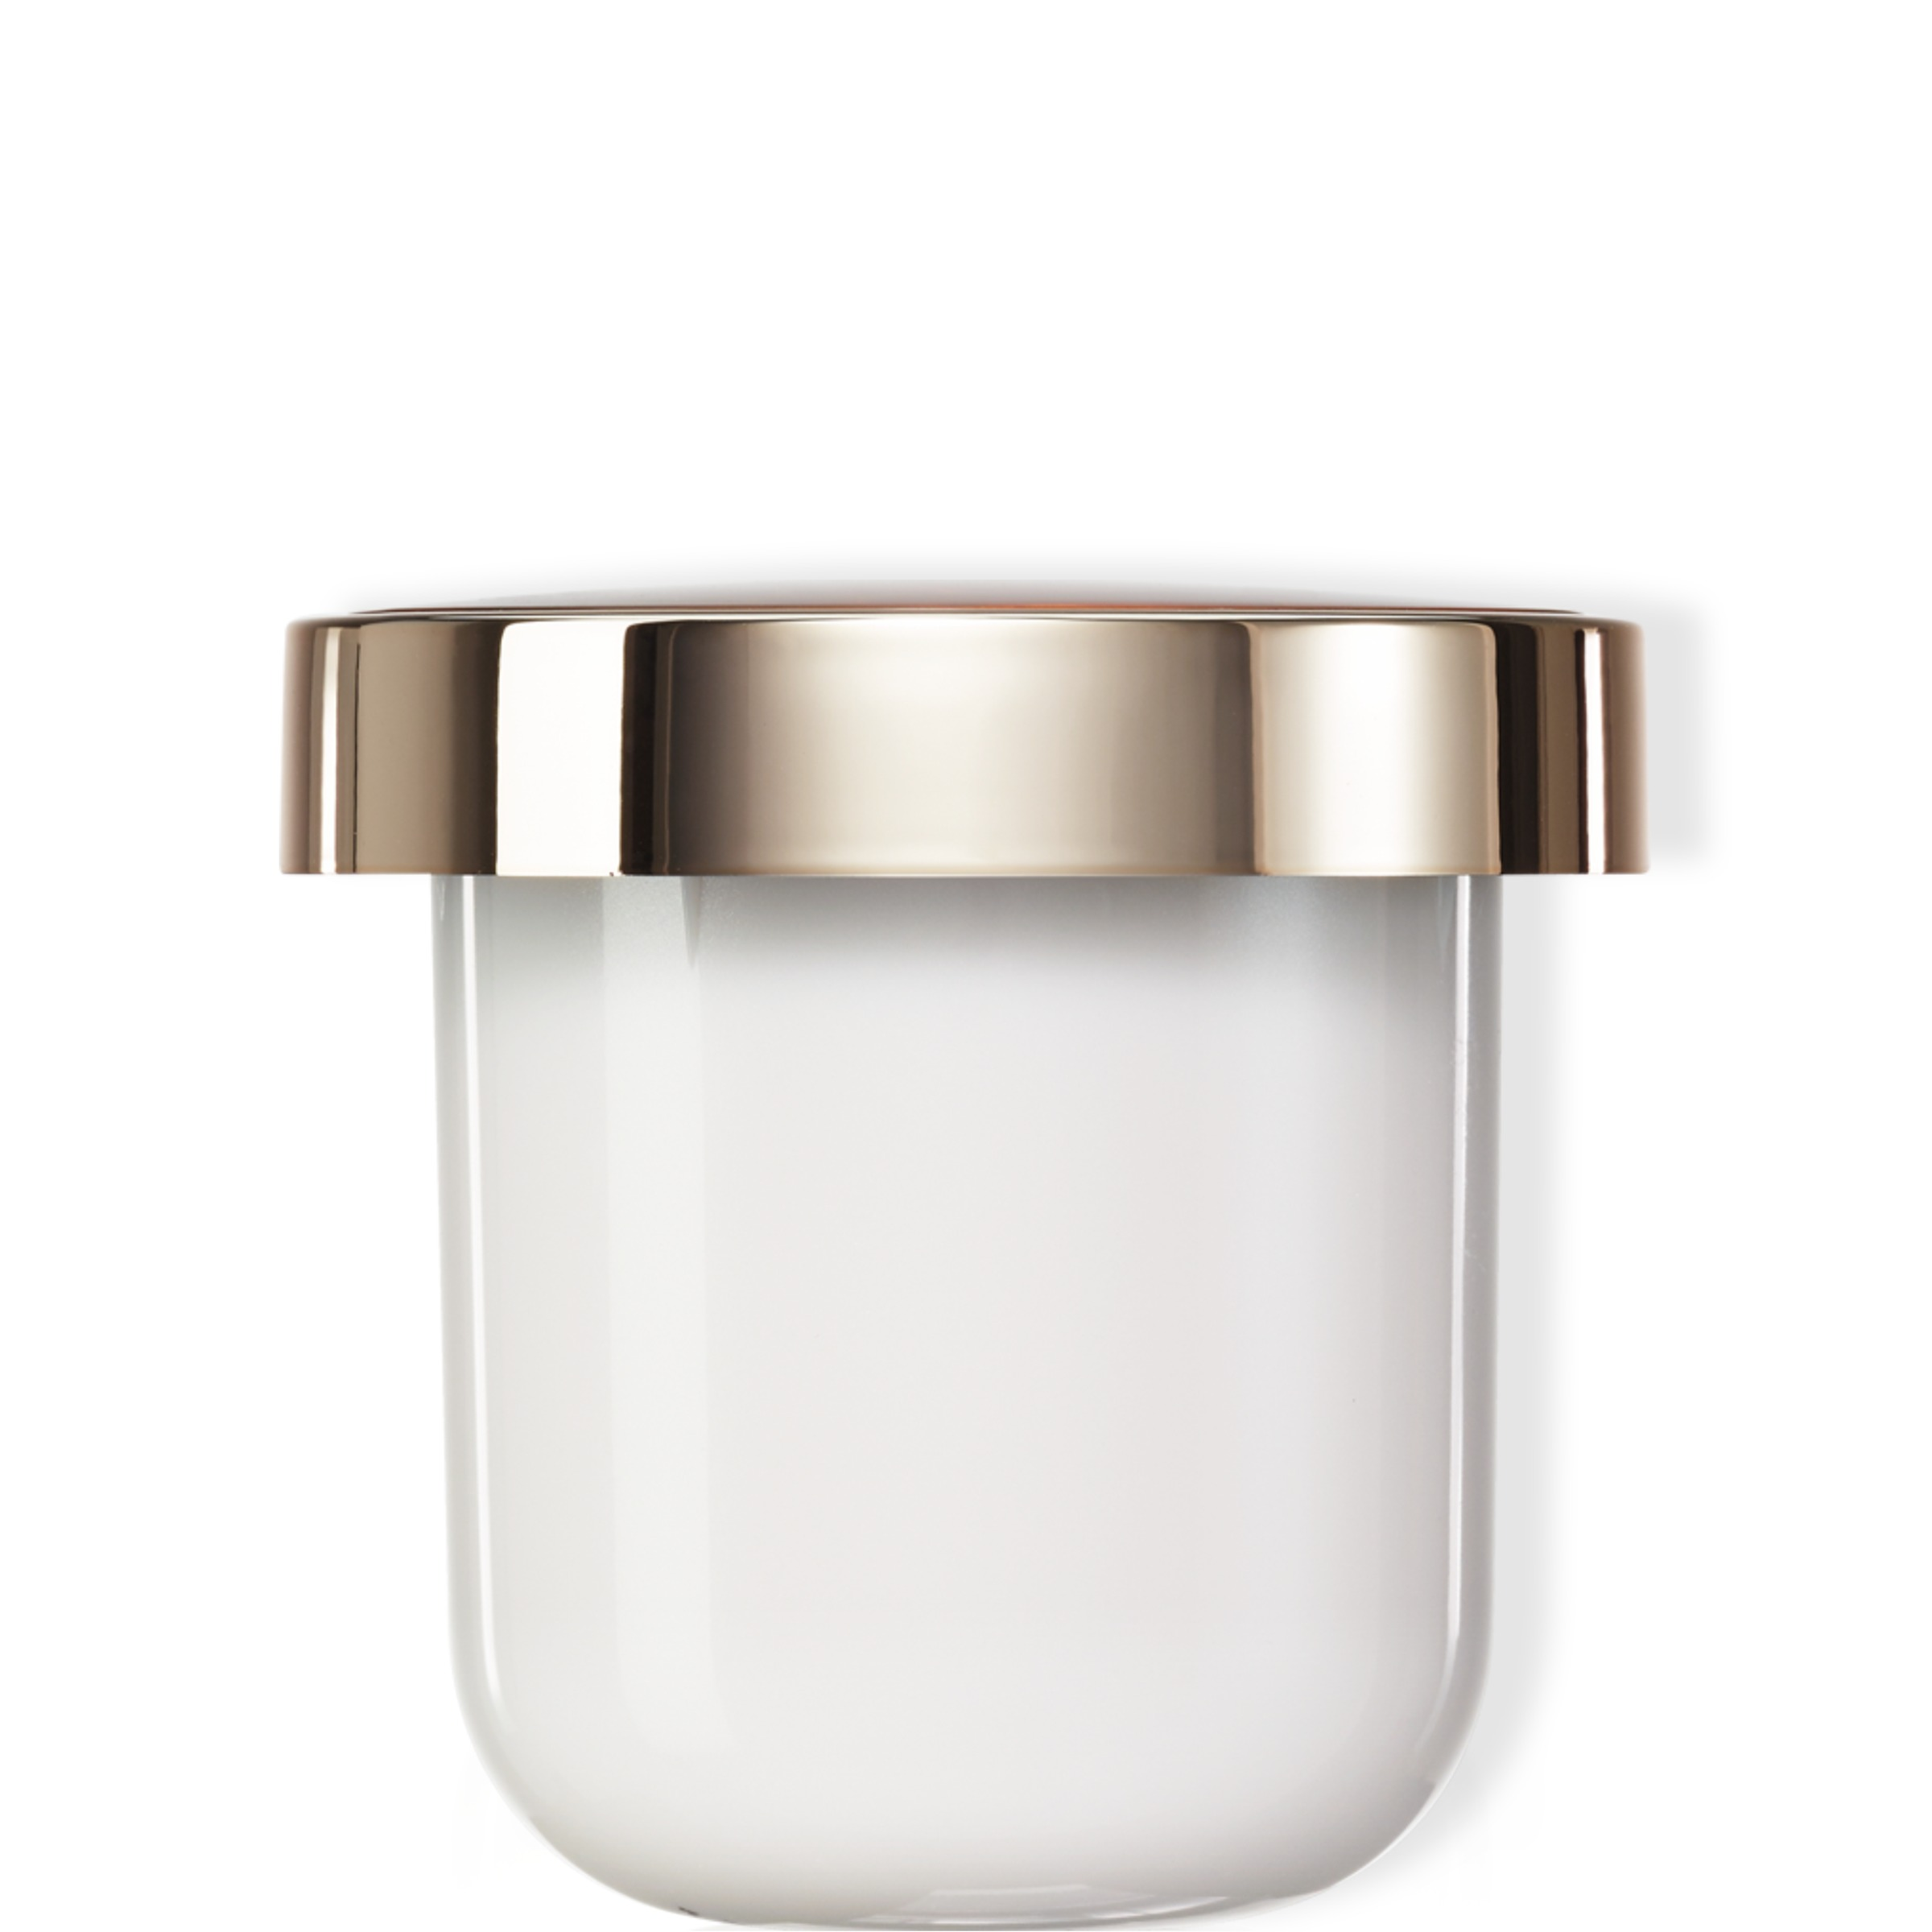 Prestige Eye Cream Refill